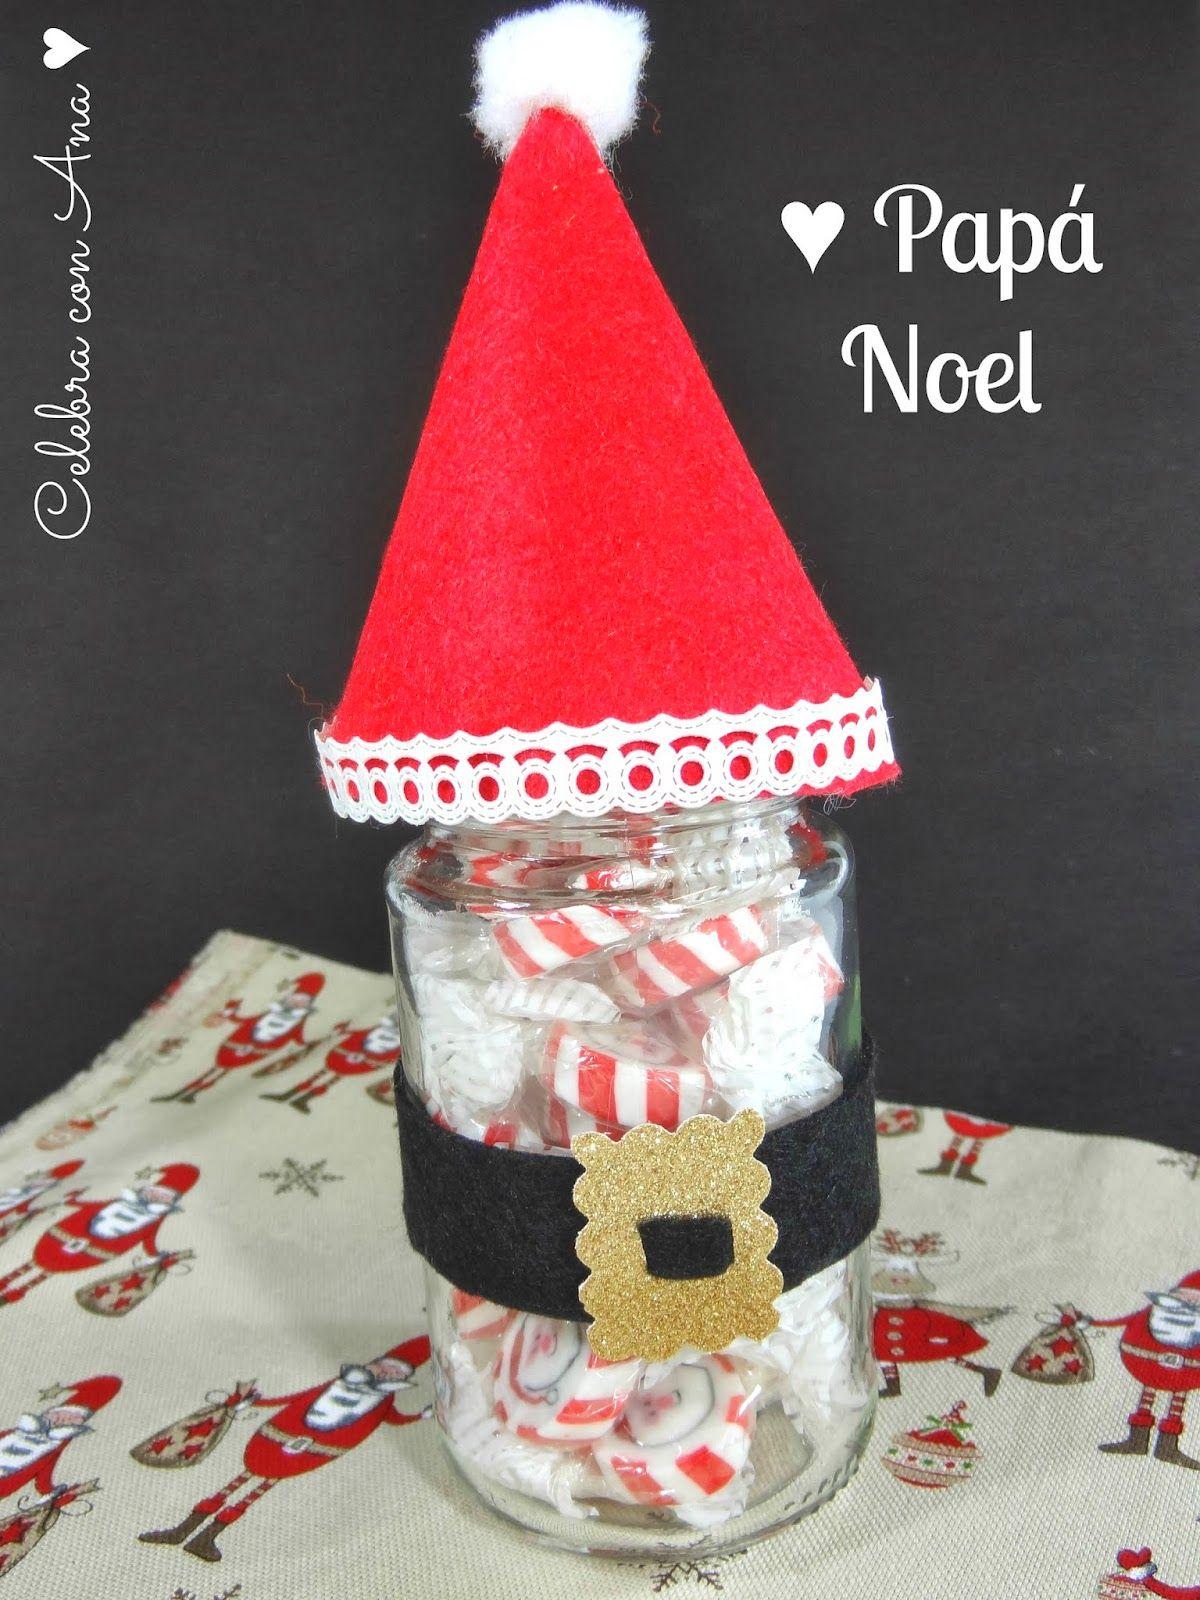 Bote Chuches Pap Noel Regalar Chuches Pinterest Pap Noel  ~ Ideas Para Regalar En Navidad Manualidades